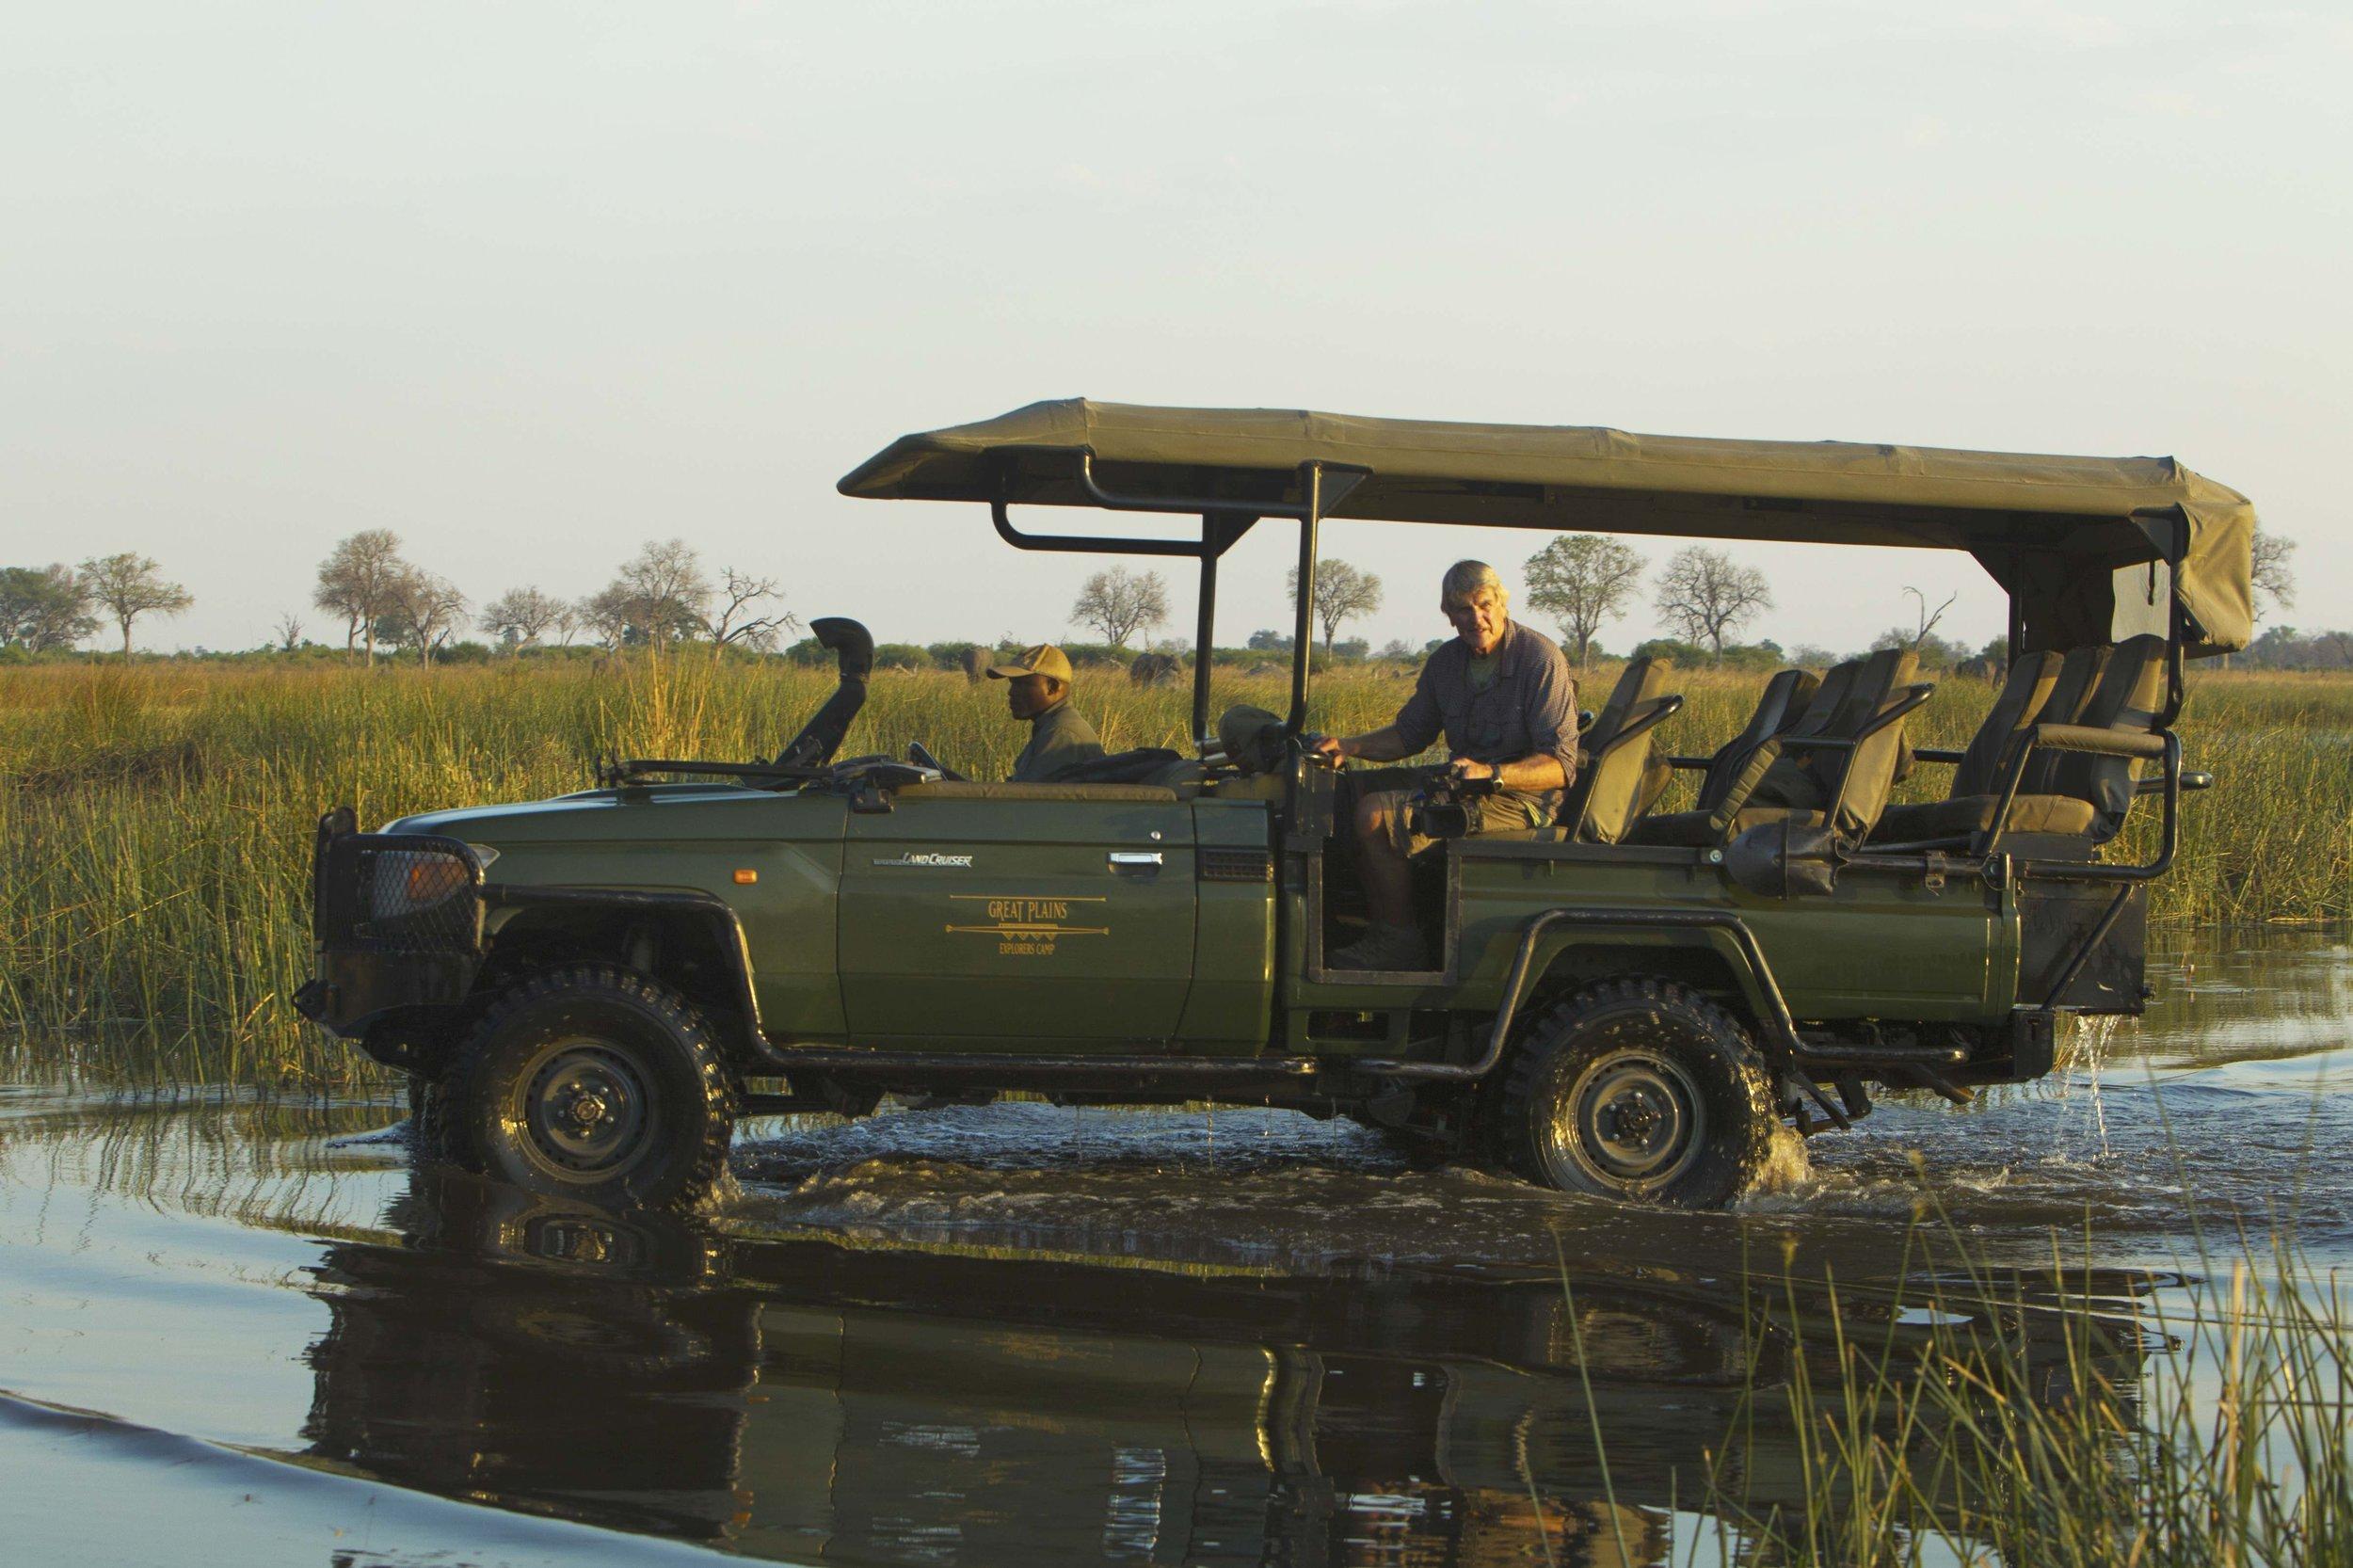 selindacamp-safari-experience-greatplainsconservation-10.jpg